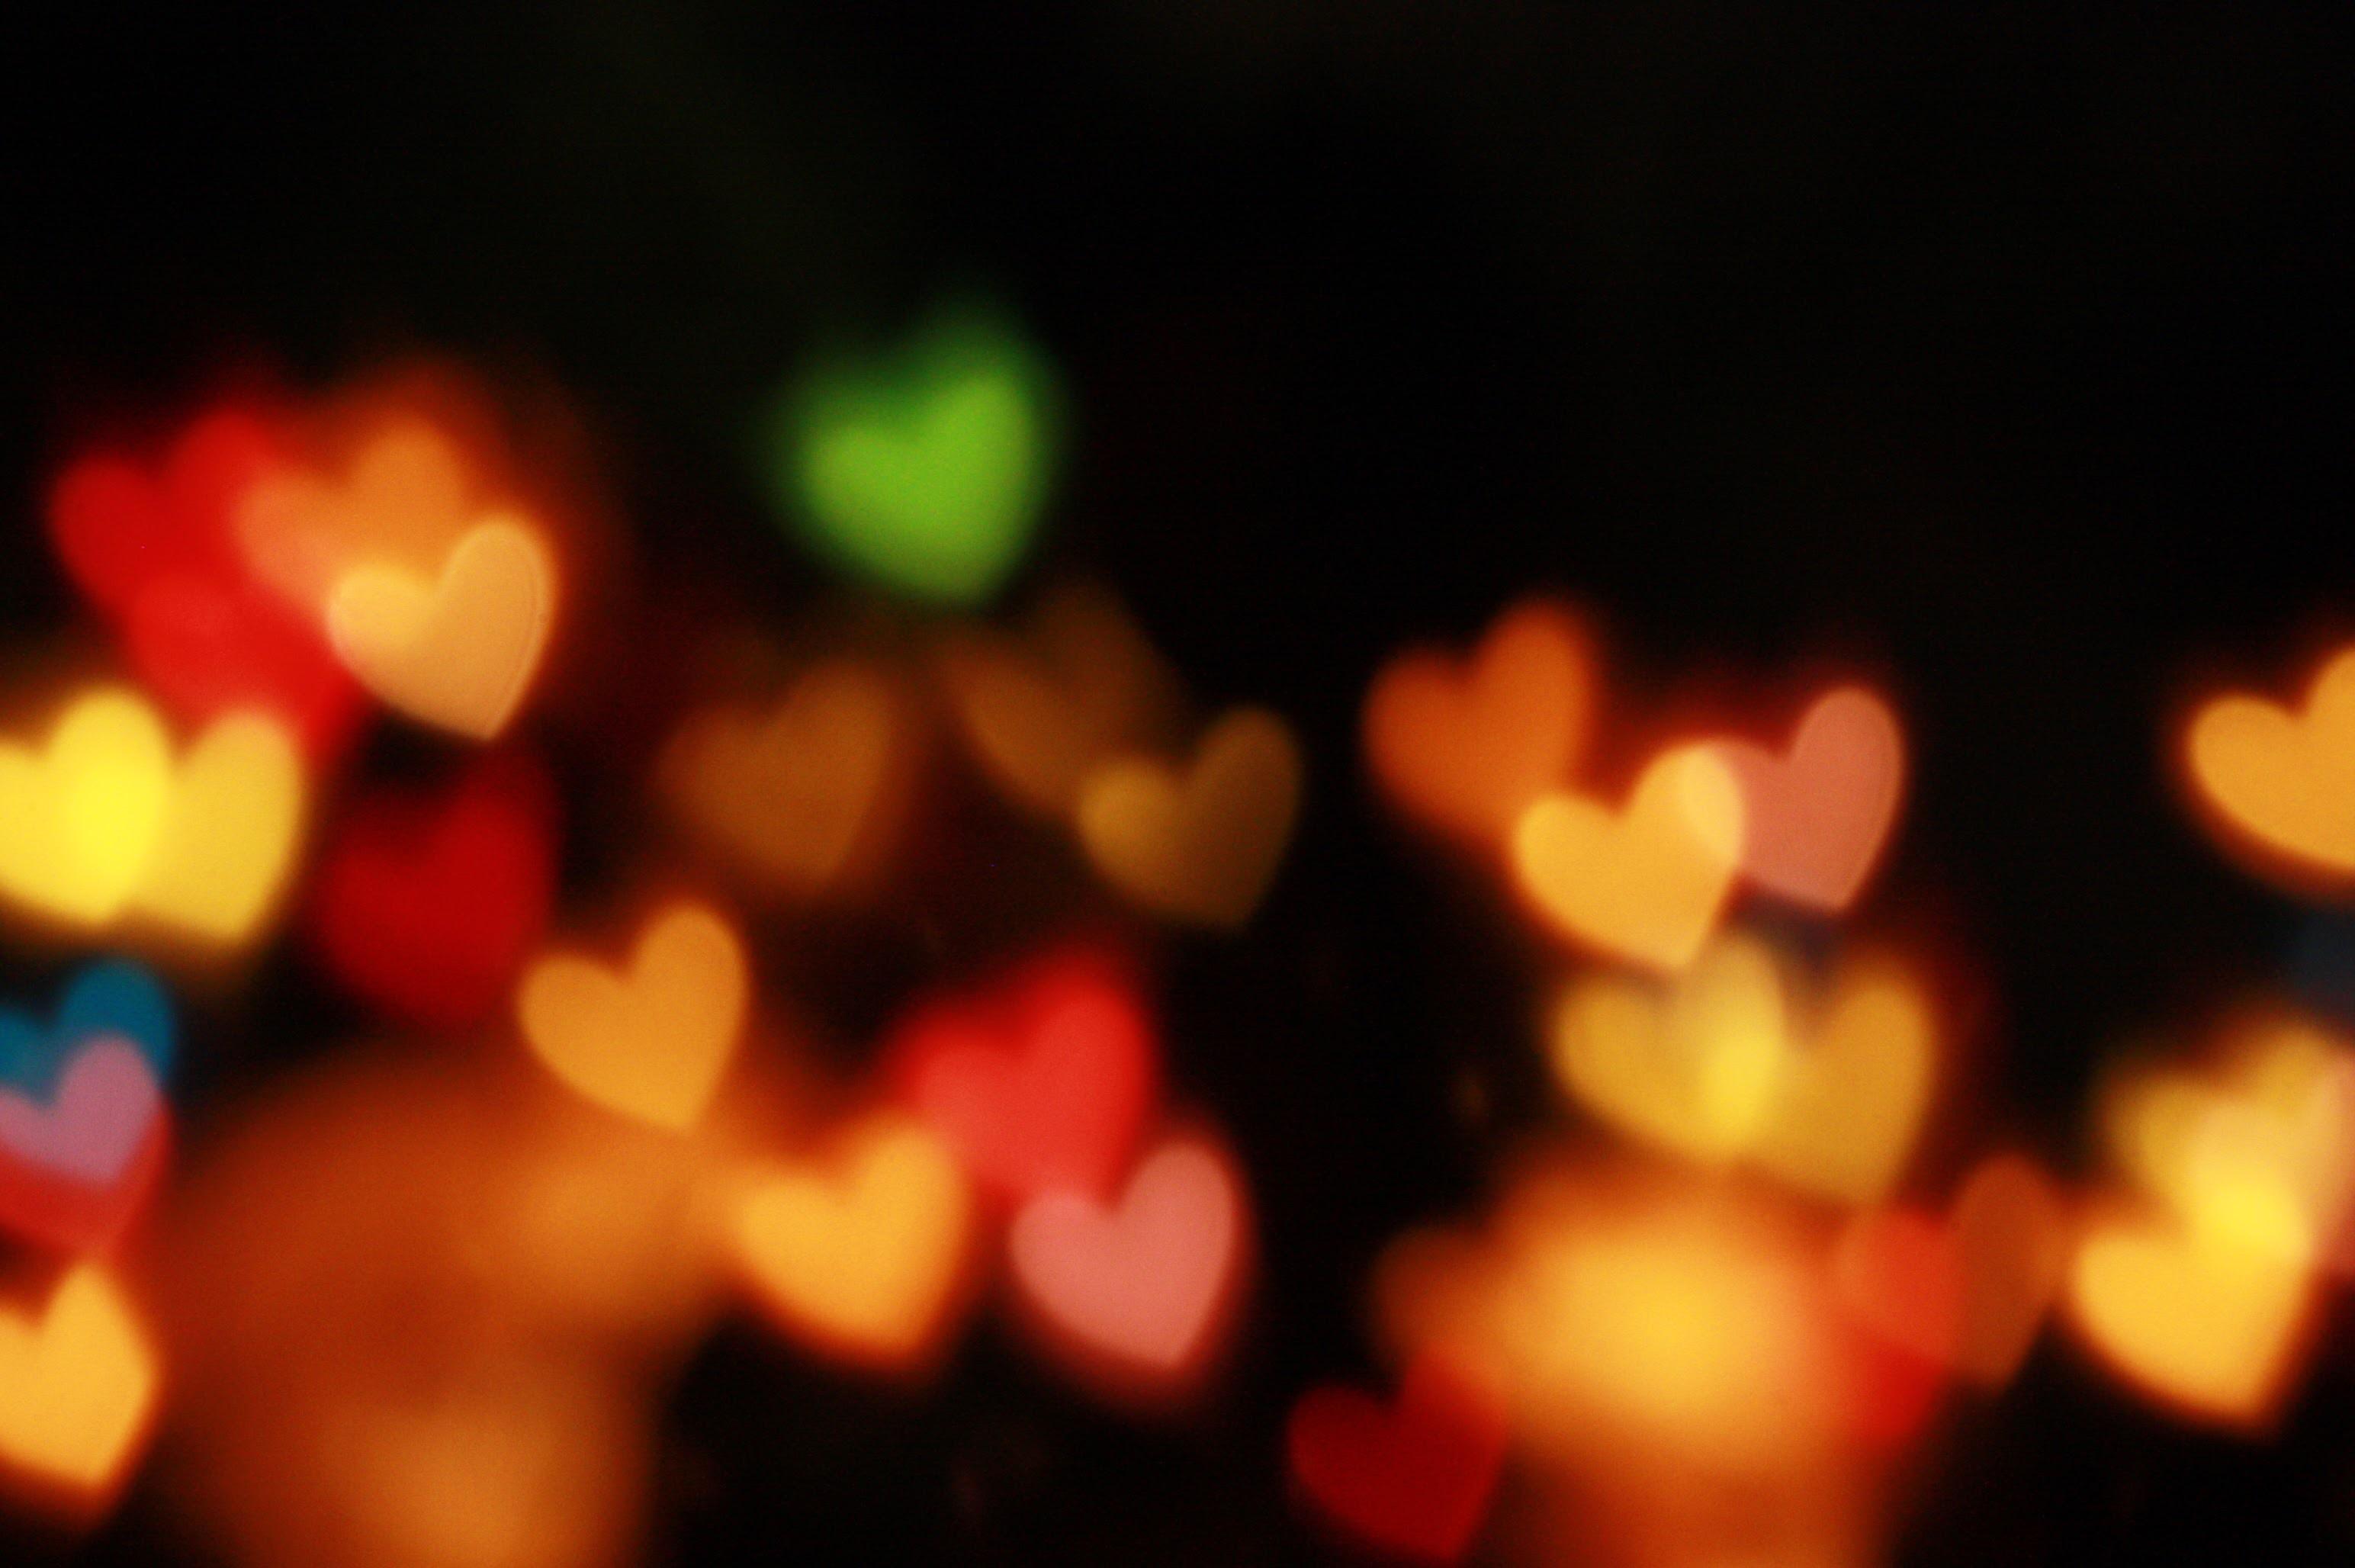 Illuminated multi-colored hearts against a black backdrop